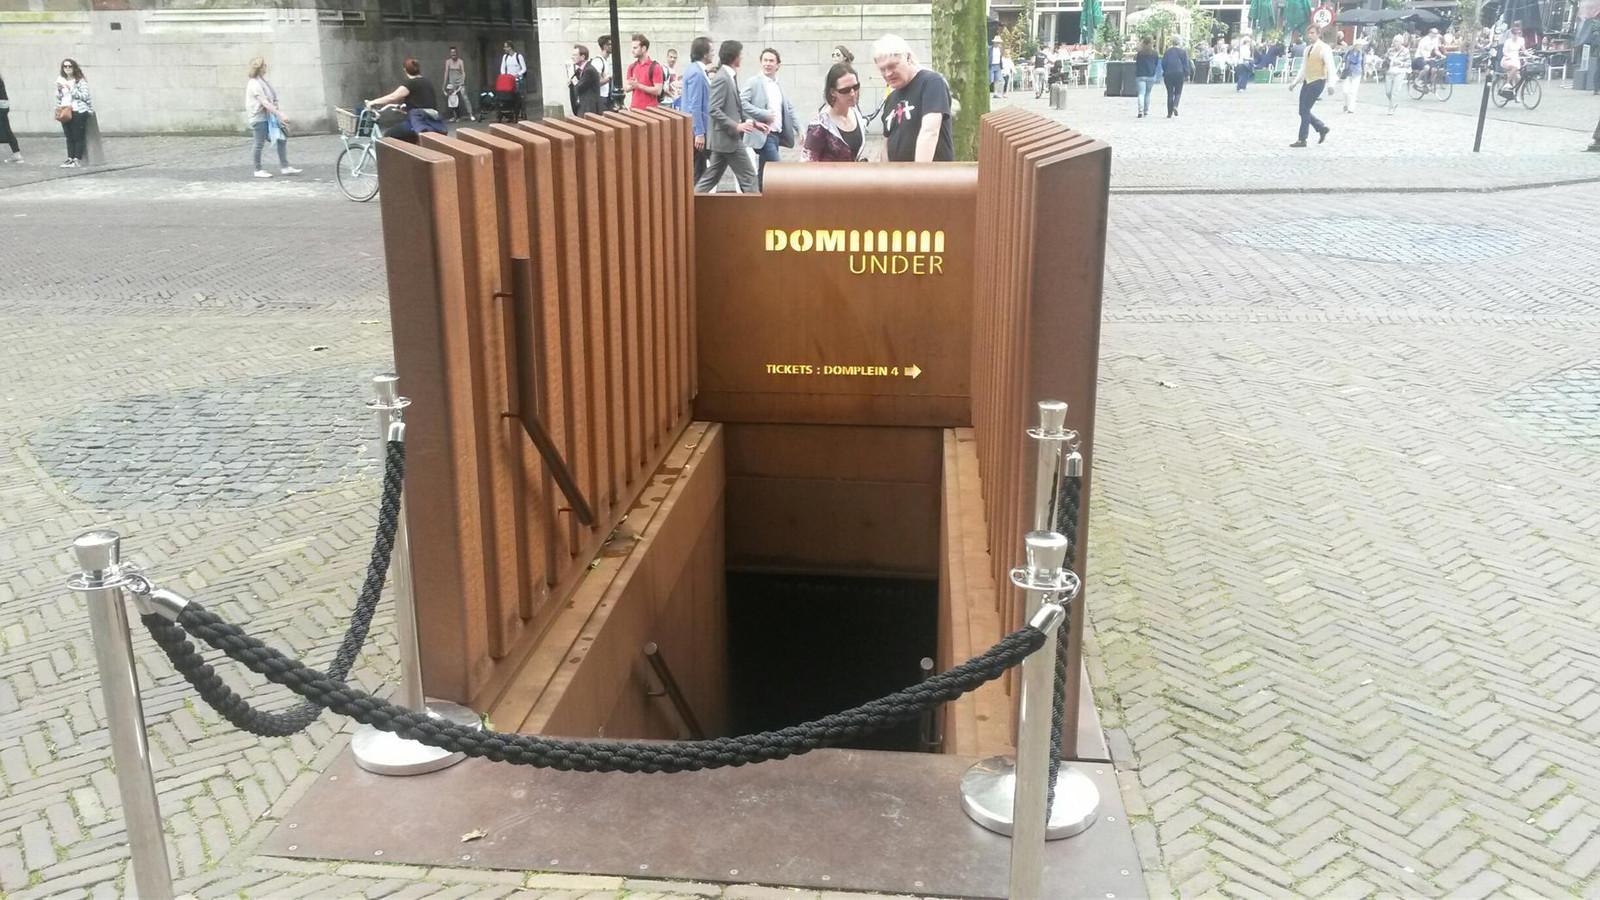 De ingang van DOMunder